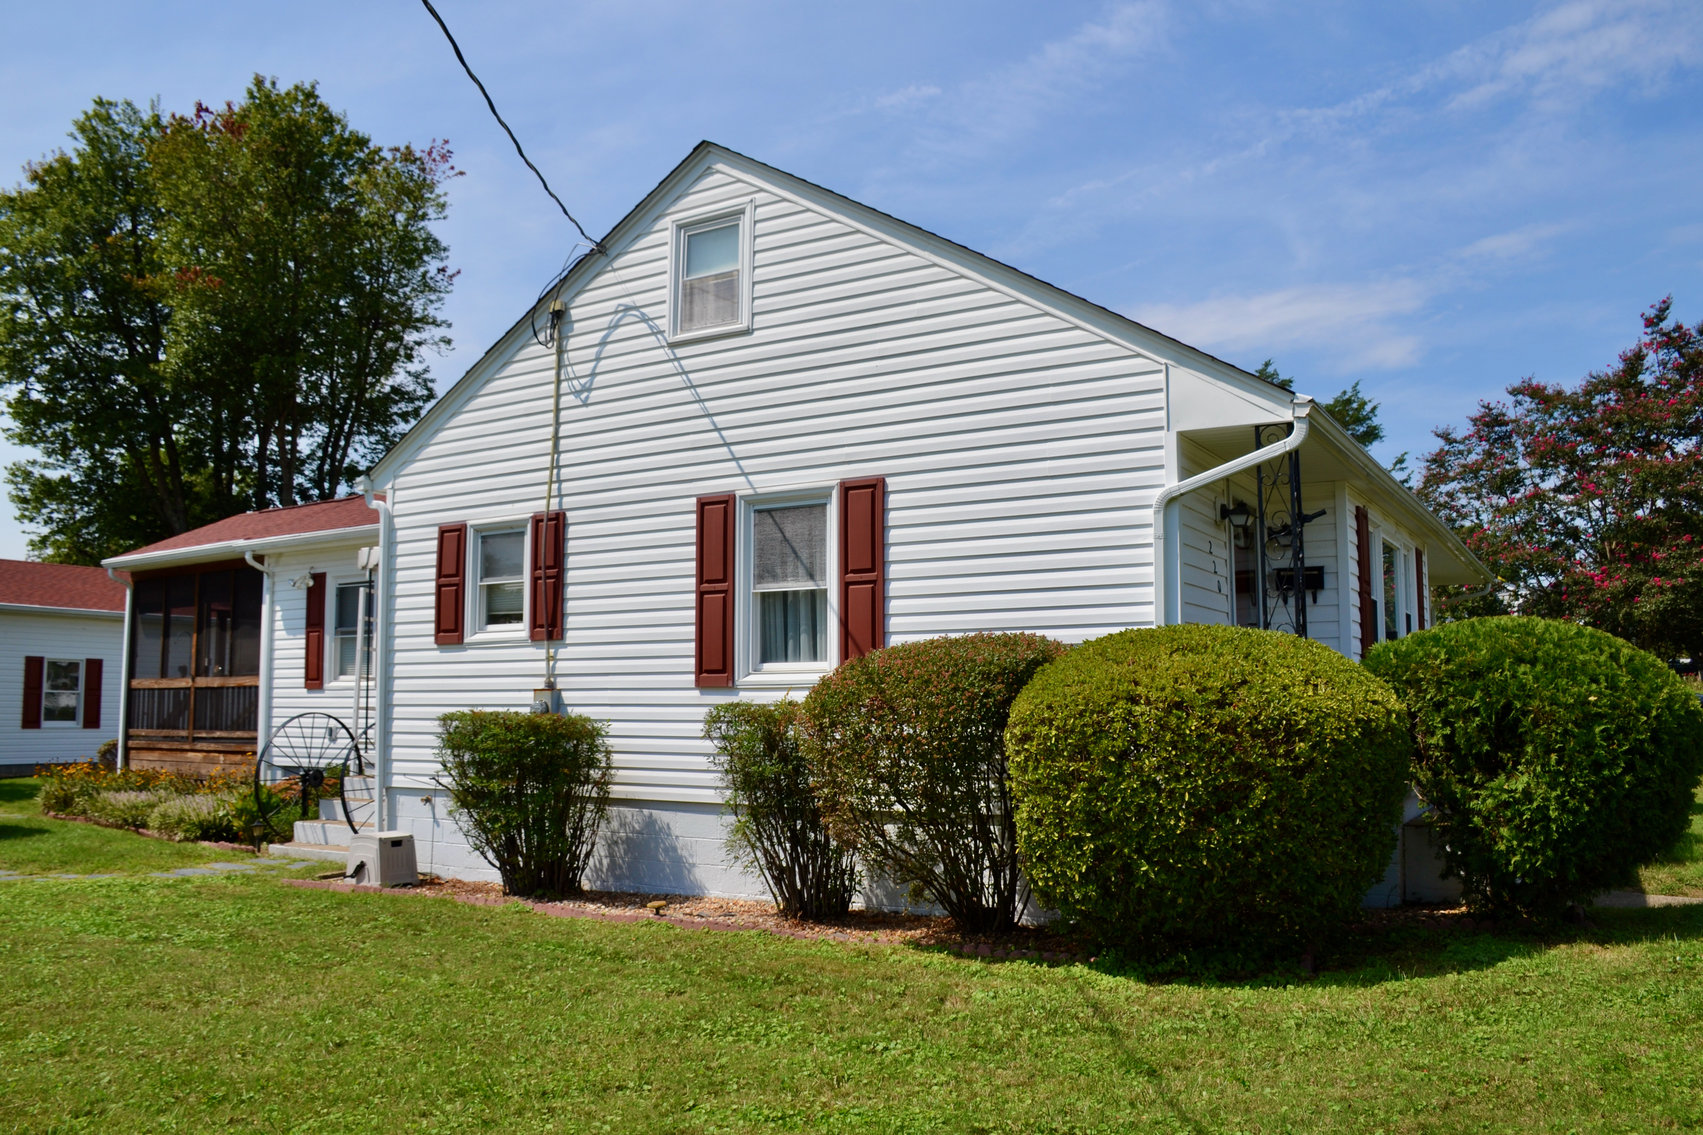 Image for 3 BR/2 BA Home w/Detached Garage/Shop on Double Corner Lot--Spotsylvania County, VA